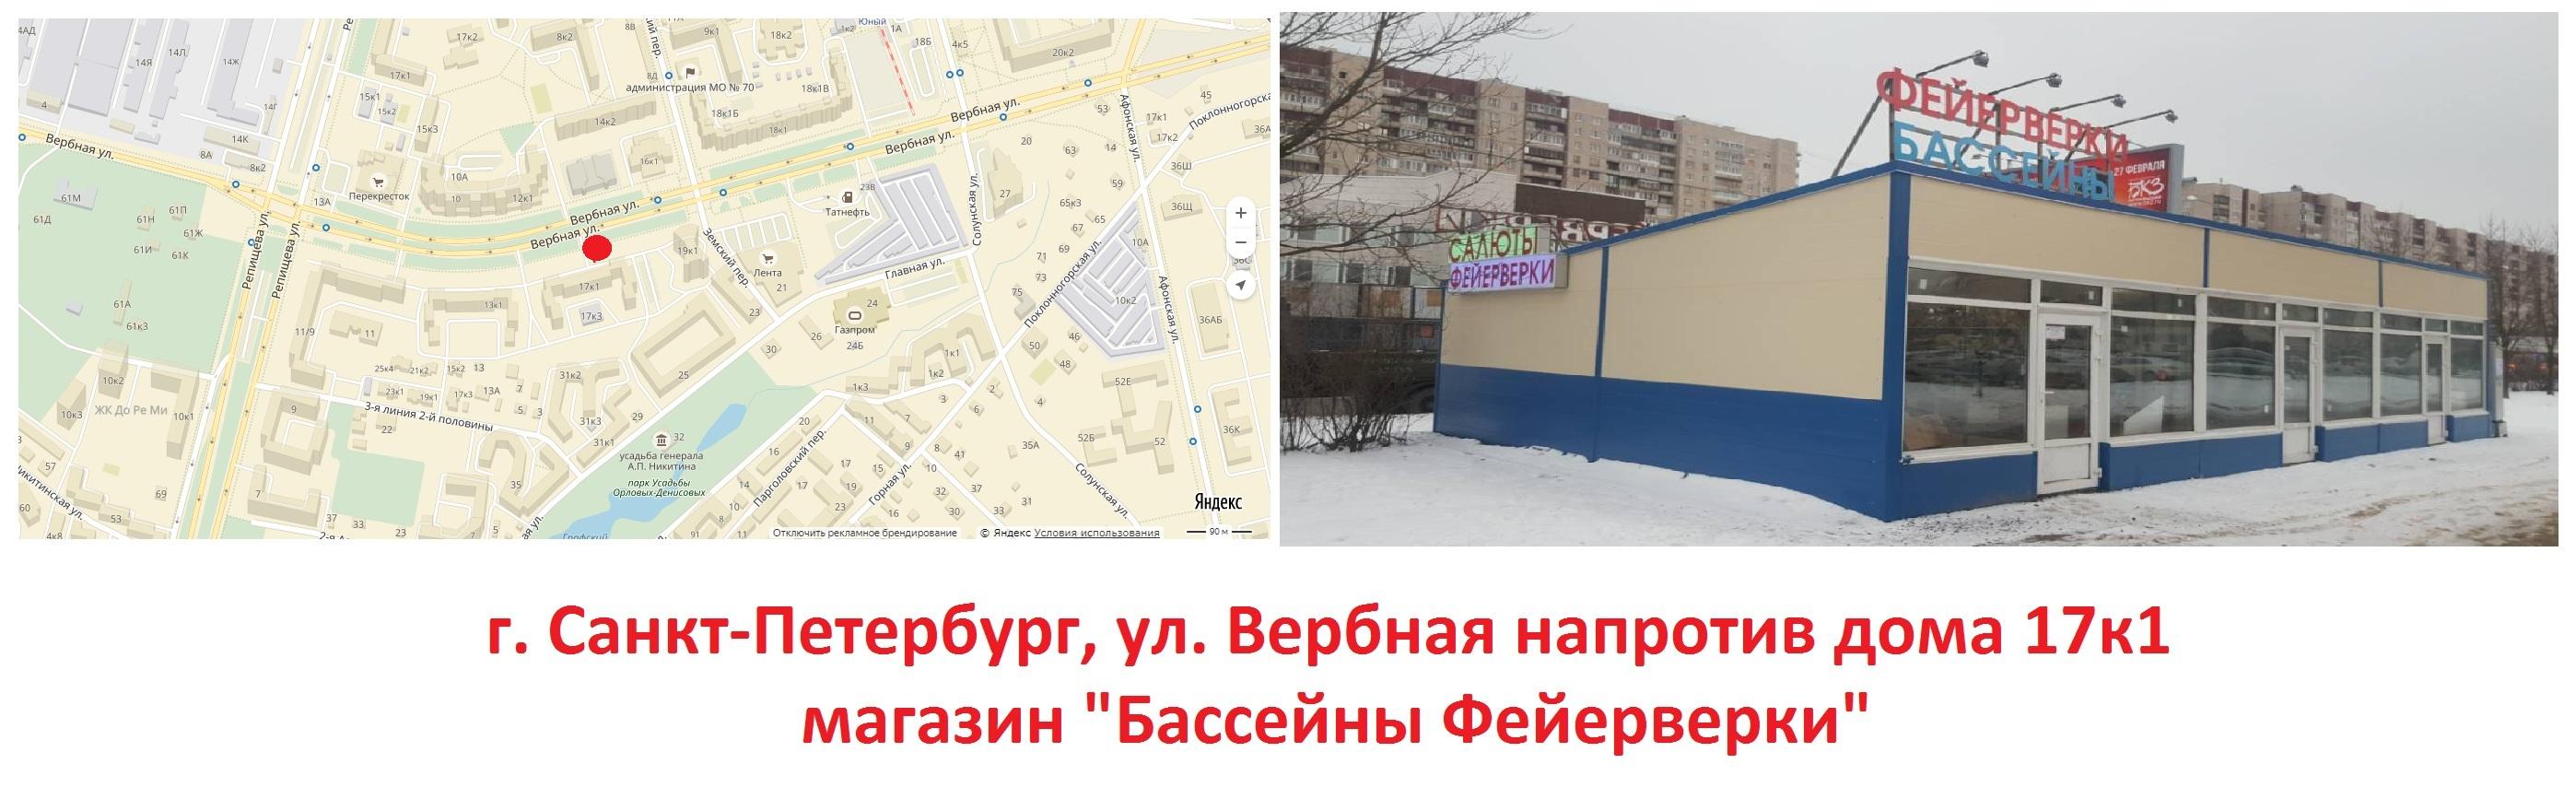 магазин на ул. Ильюшкина